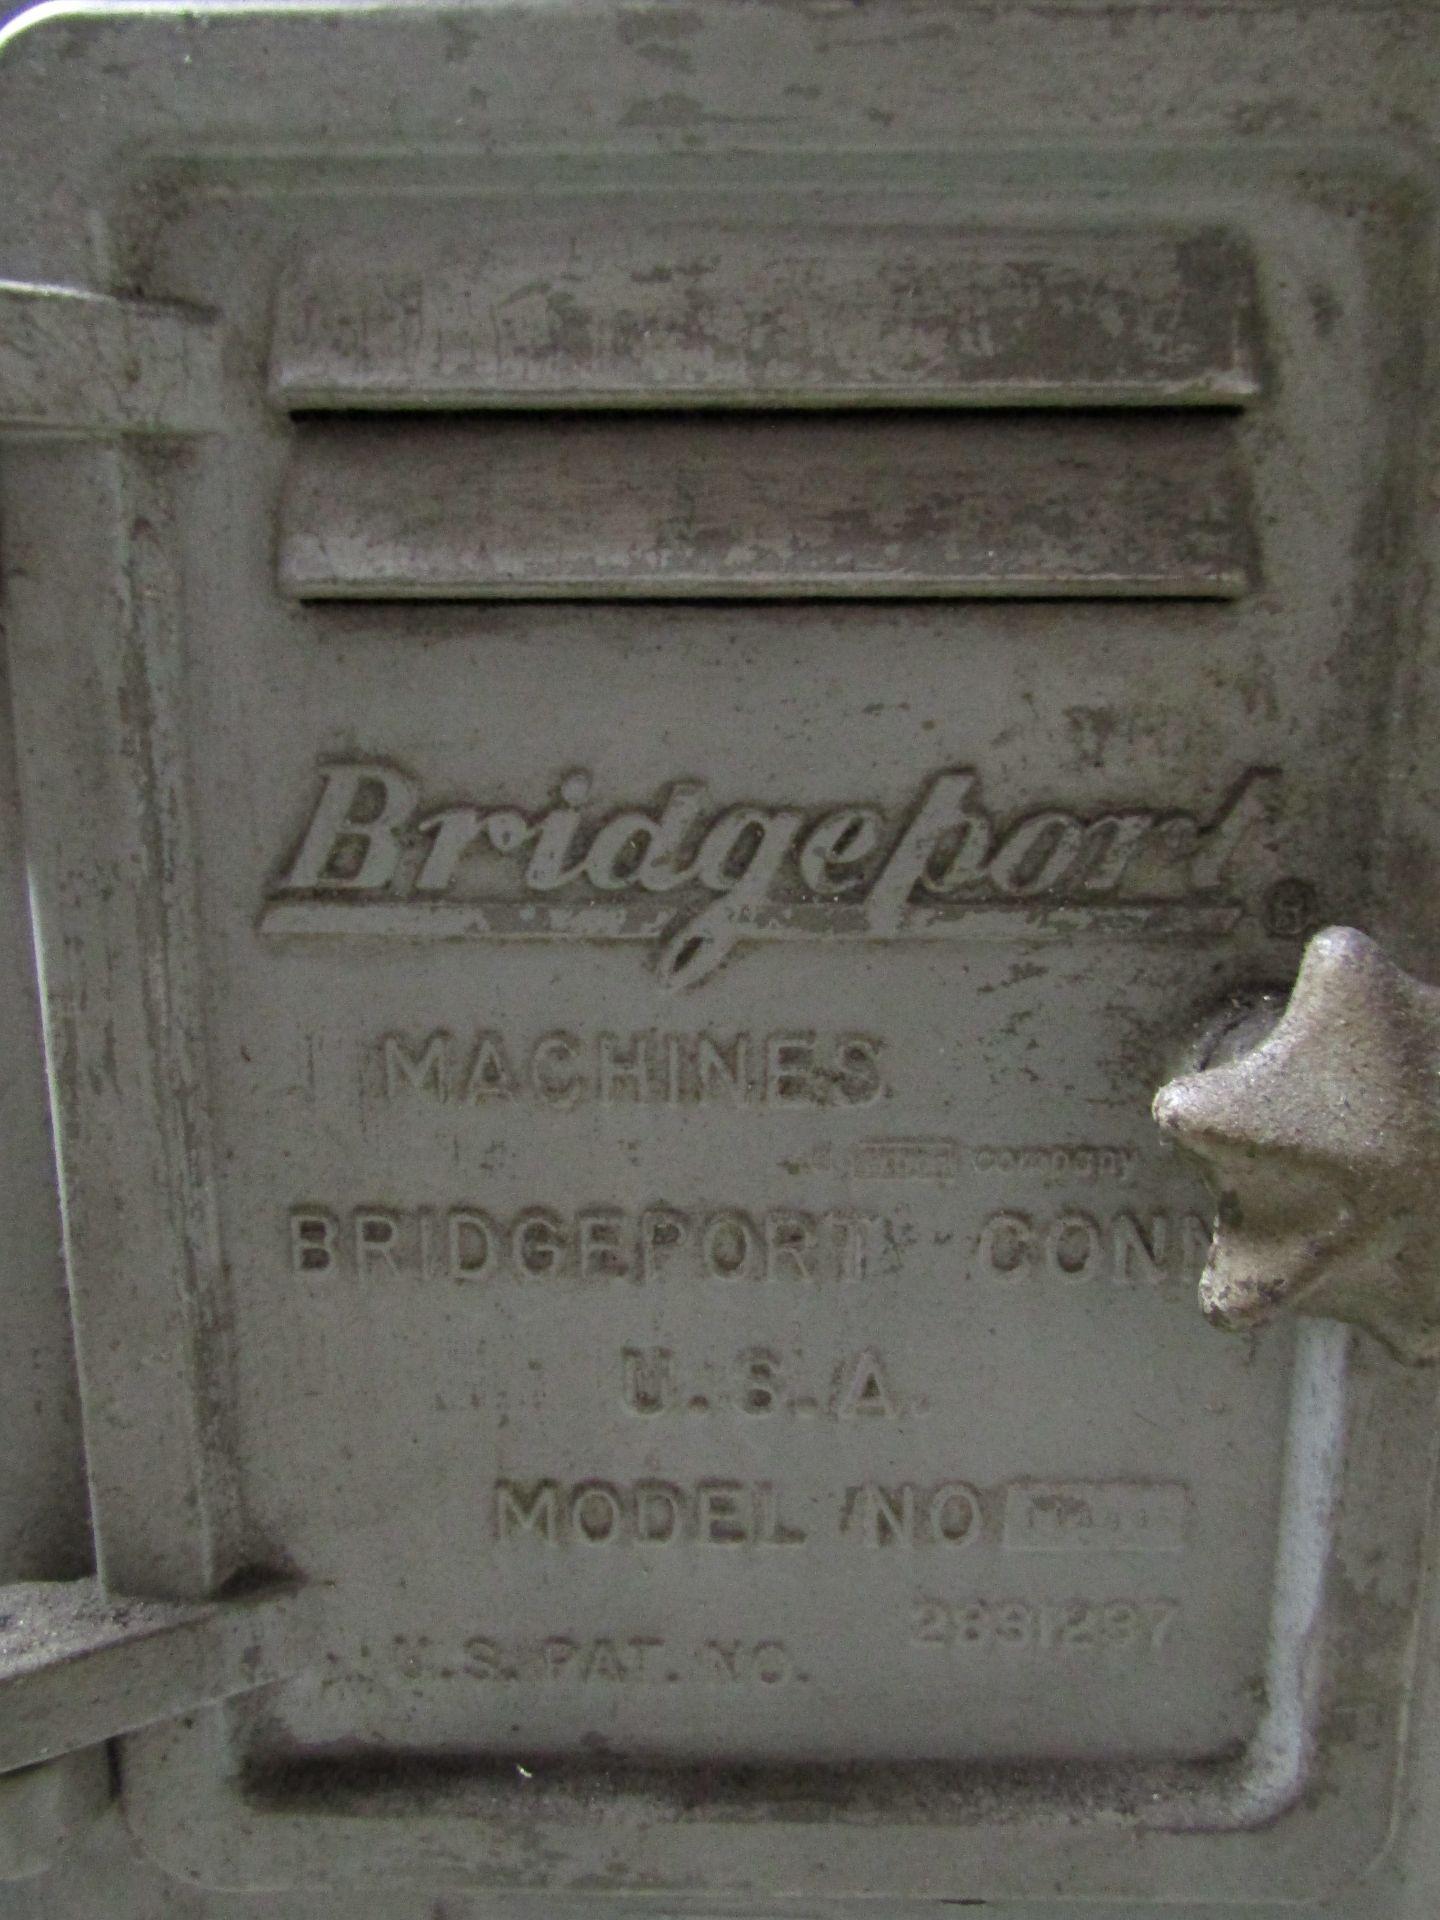 Lot 1 - BRIDGEPORT Vertical Mill, Model 148996, S/N J153444, W/ Sargon Model 652 Digital Read Out